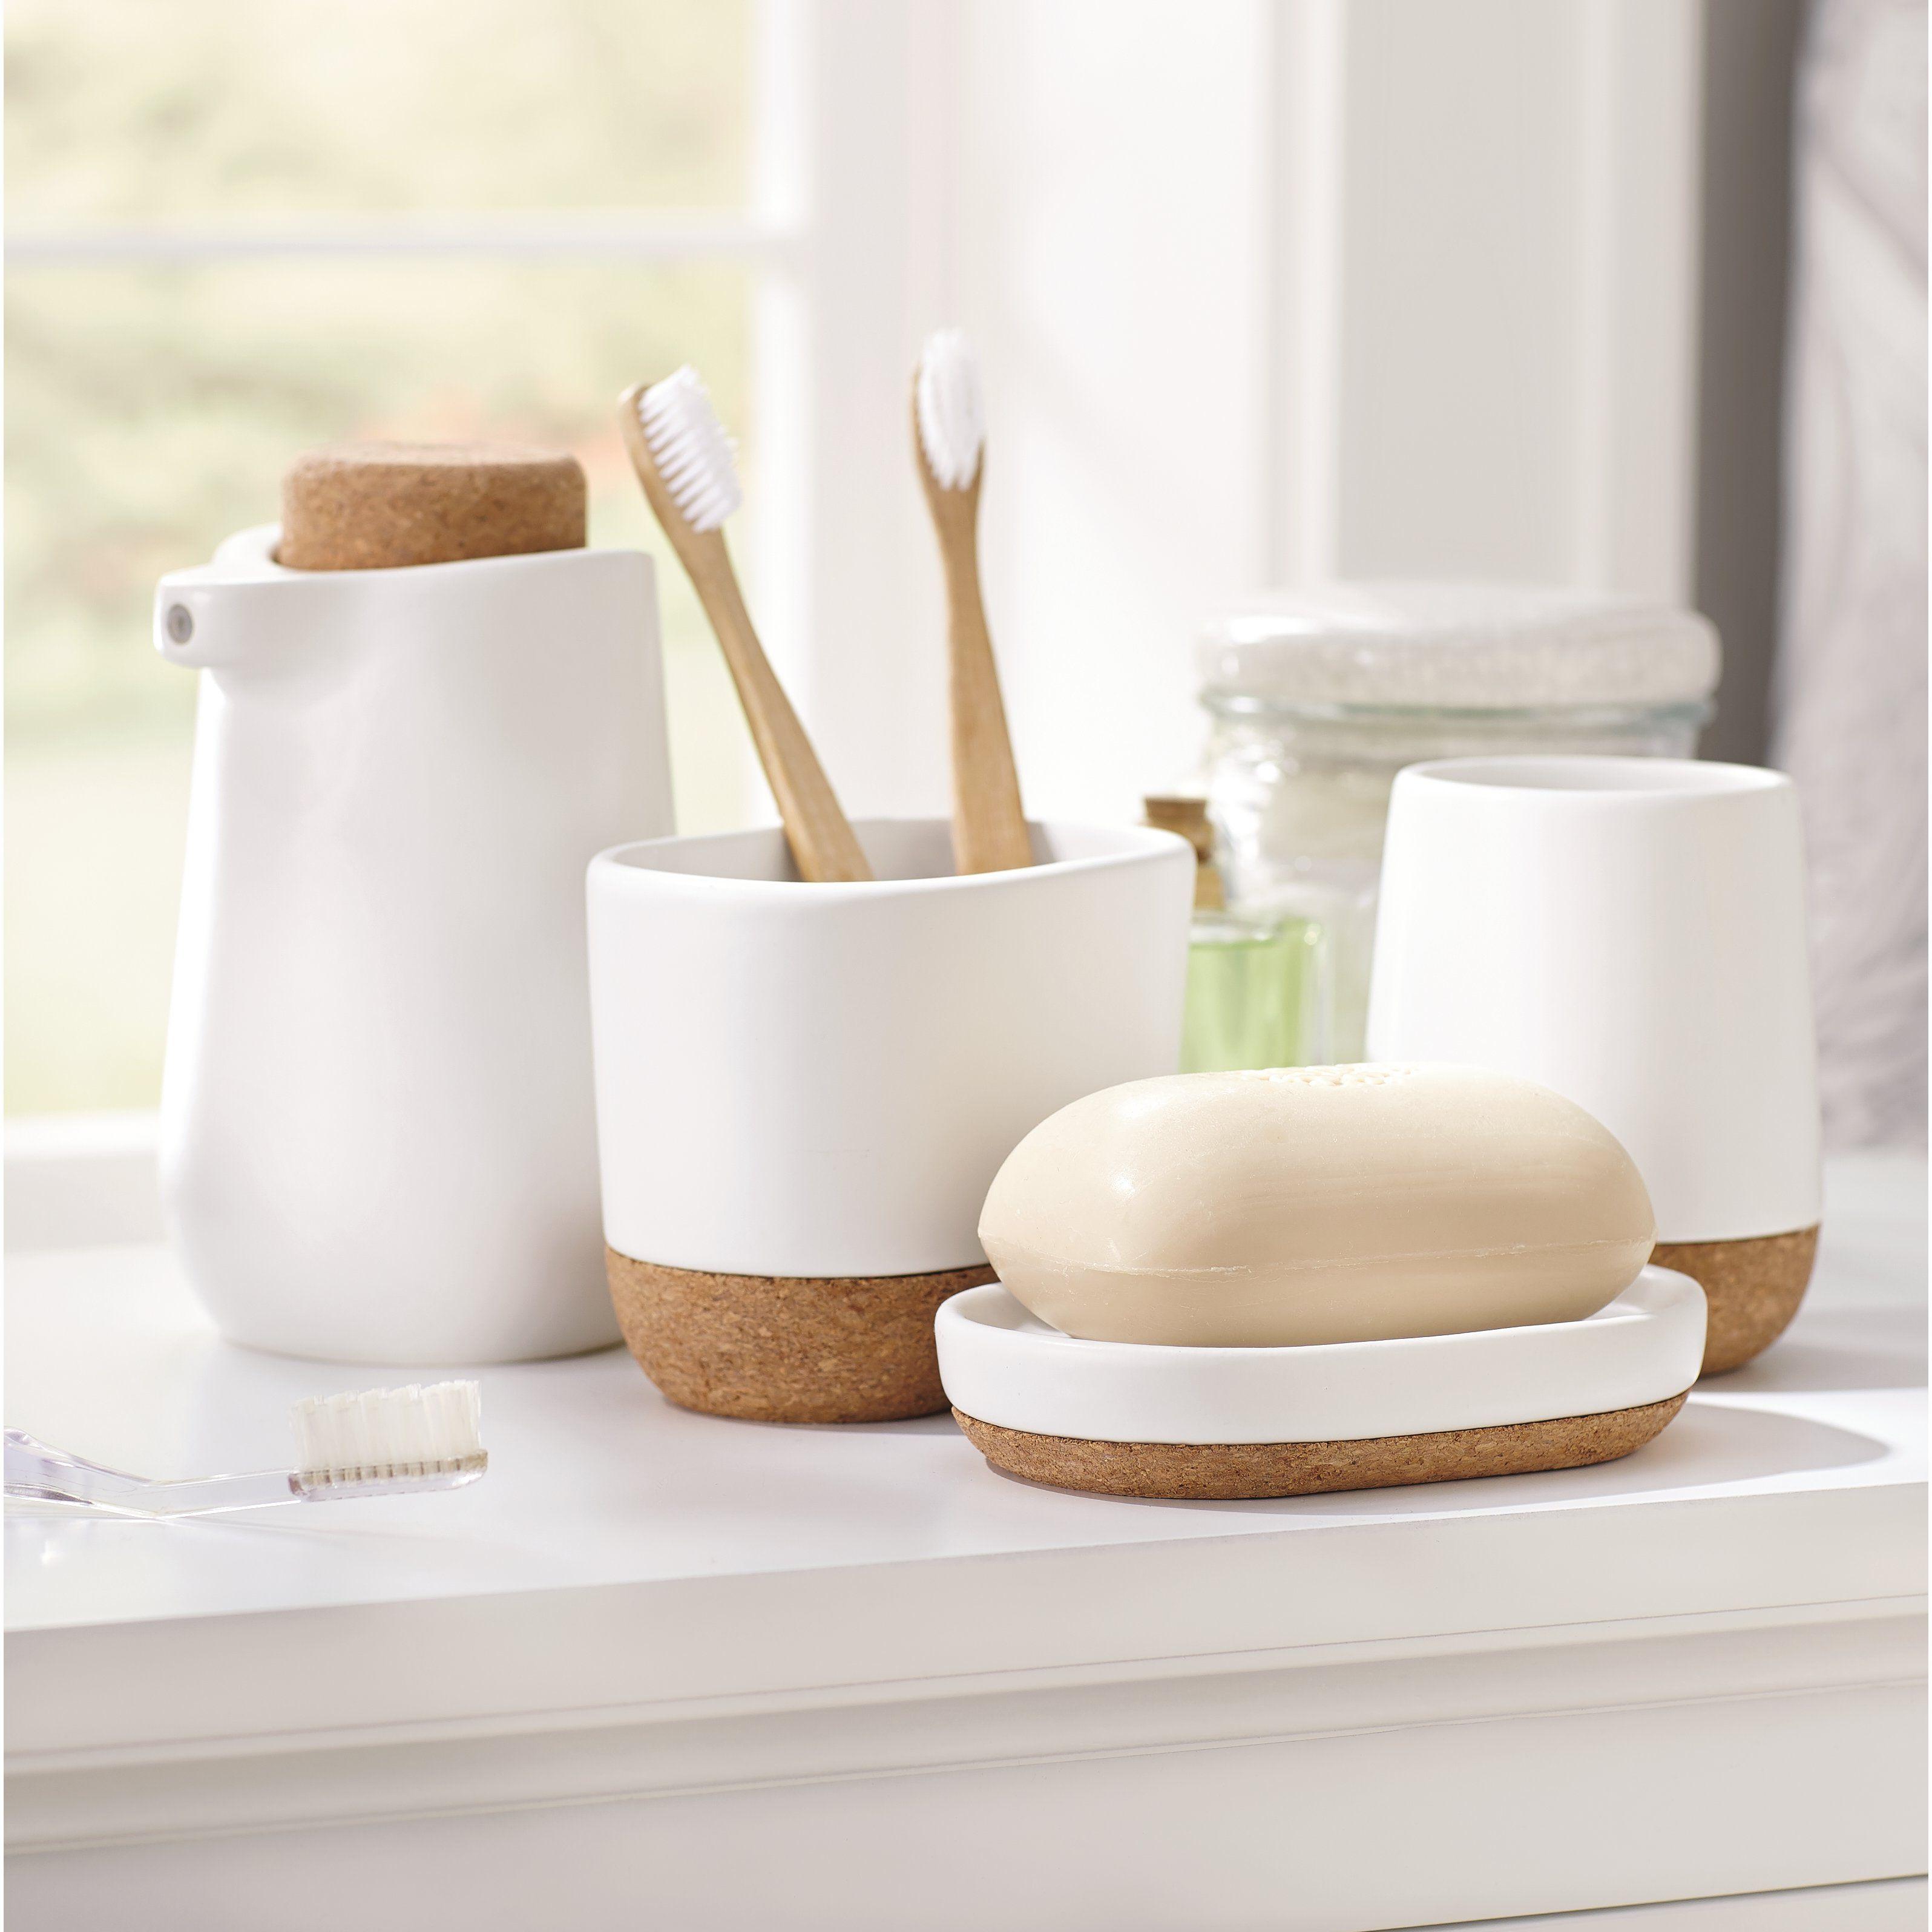 Bathroom accessories cork | ♤Bath accessories set♤ | Pinterest ...